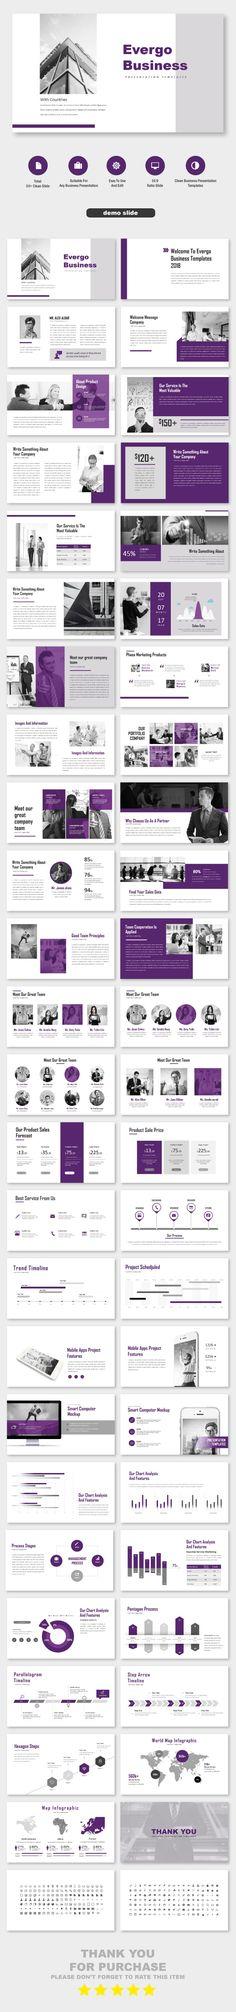 Evergo Business Proposal PowerPoint Templates Business Presentation by CreatorTemplate. Ppt Template Design, Creative Powerpoint Templates, Powerpoint Presentation Templates, Keynote Template, Web Design, Slide Design, Presentation Layout, Business Presentation, Pitch Deck